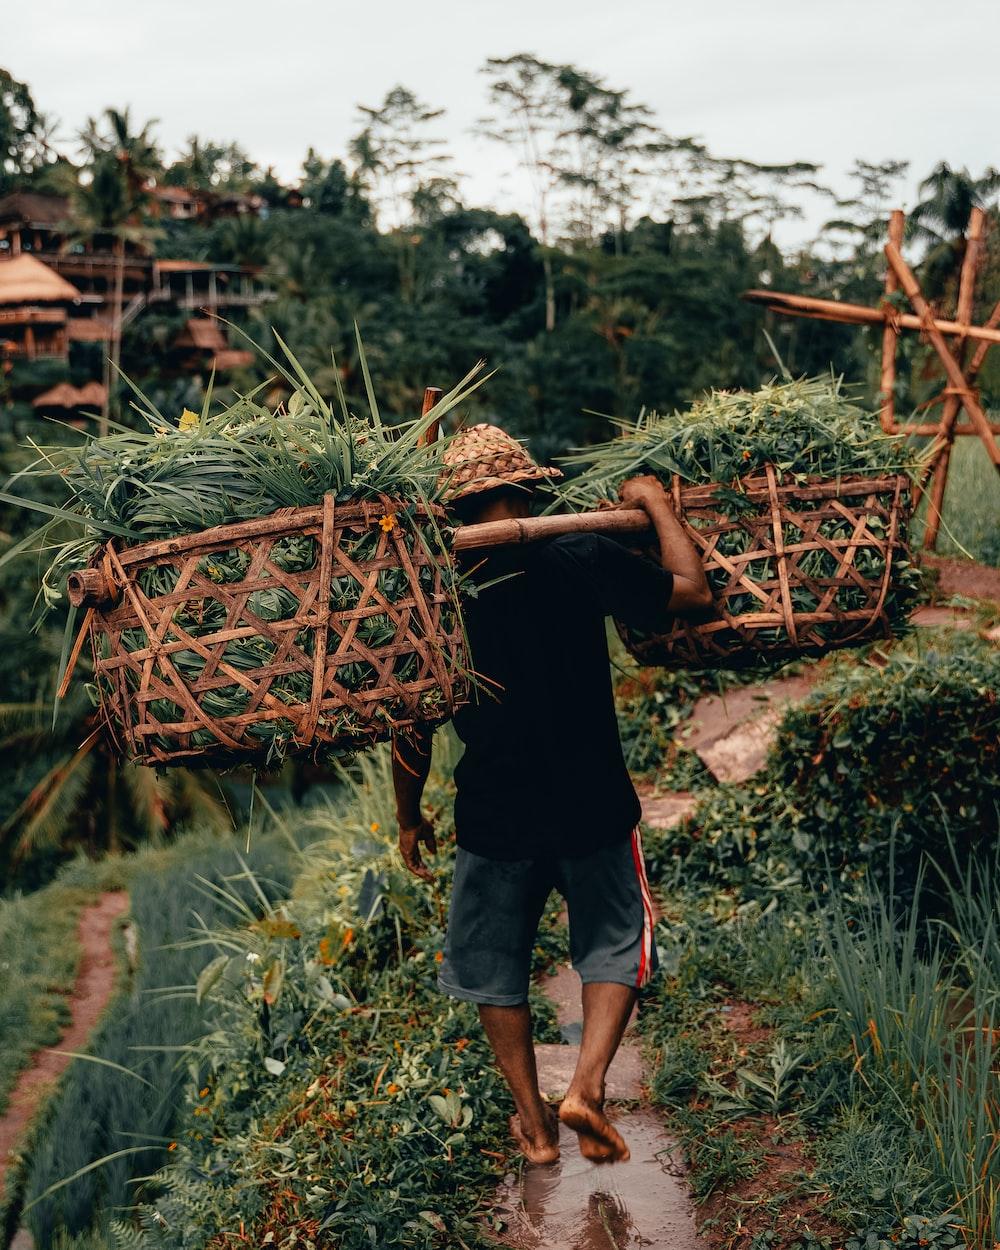 man carrying green crops